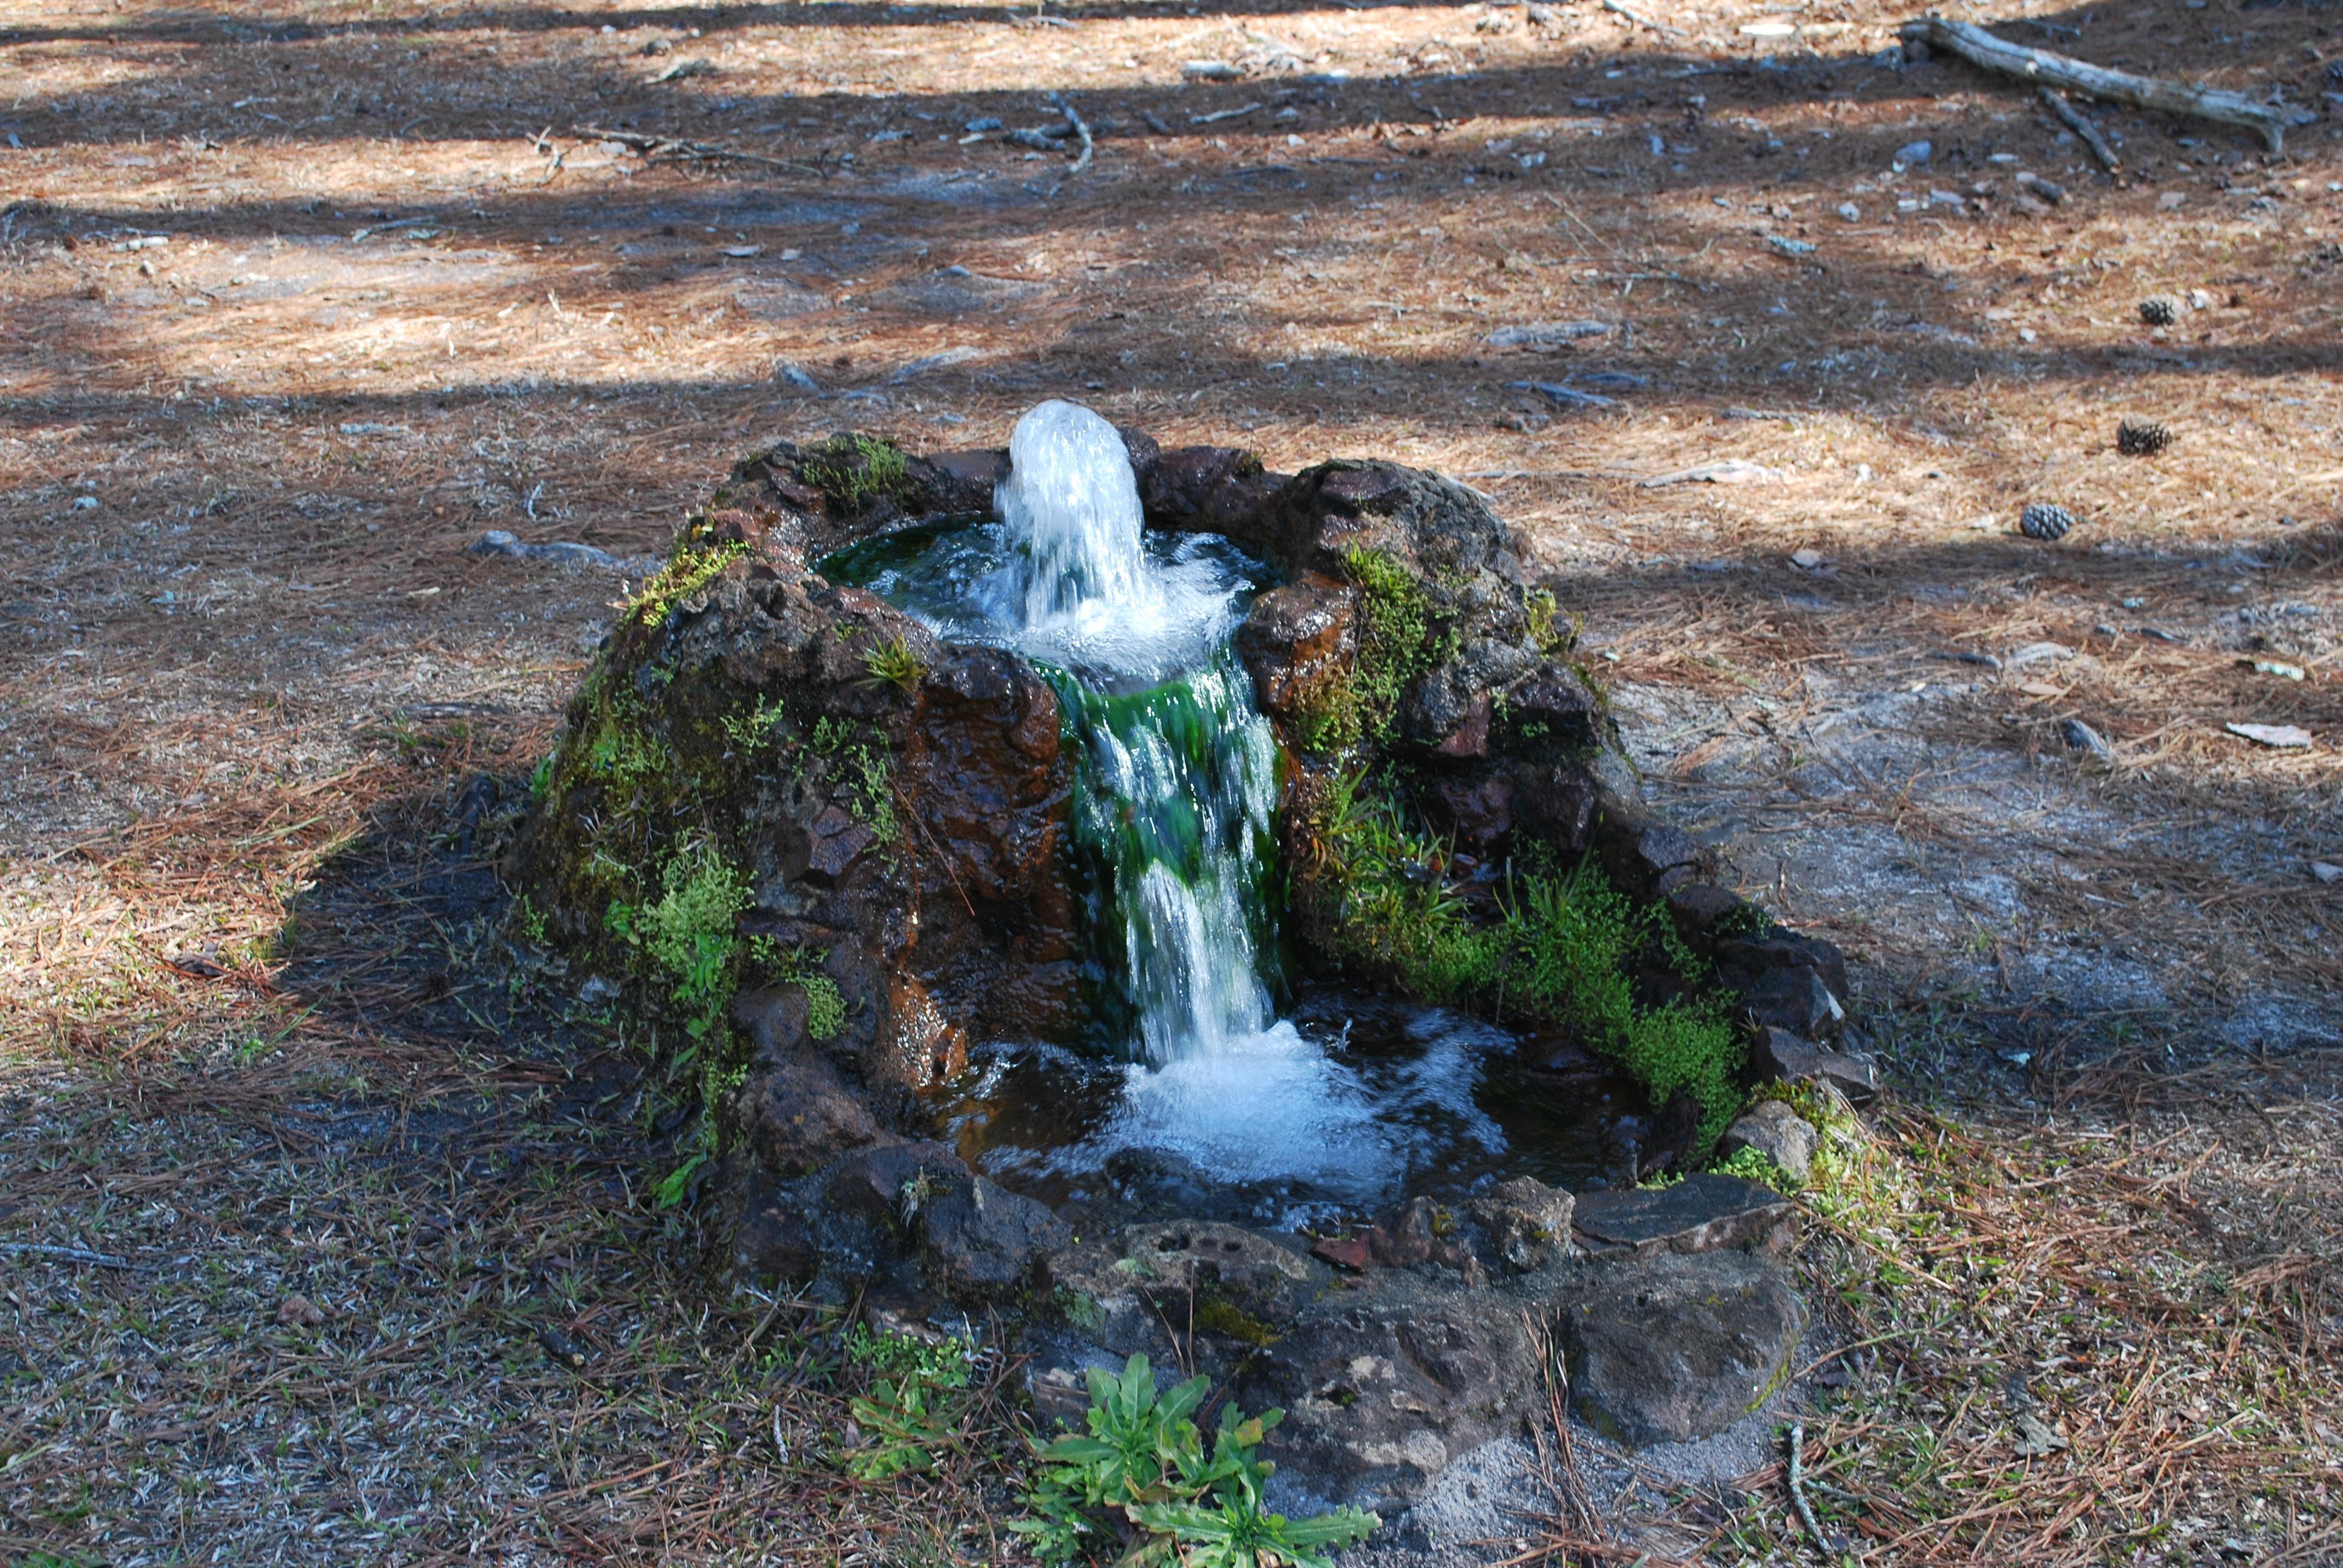 The Artesian Springs Of Schaumburg Township